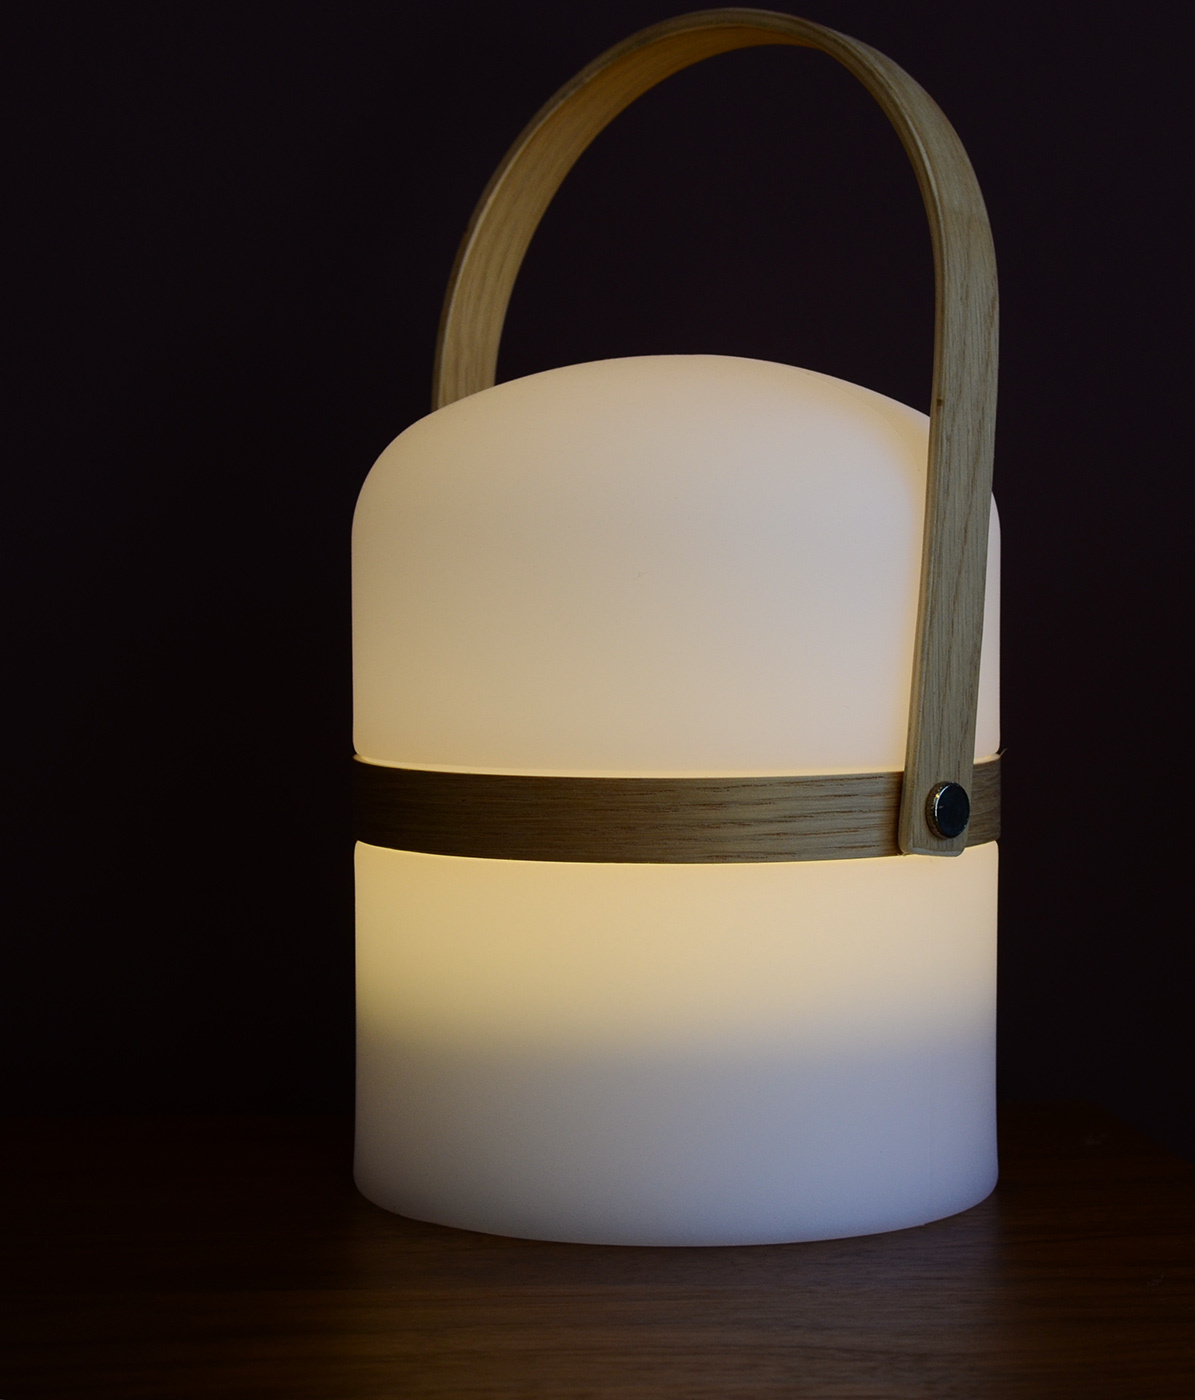 st-ives-rechargeable-lamp-on-portrait